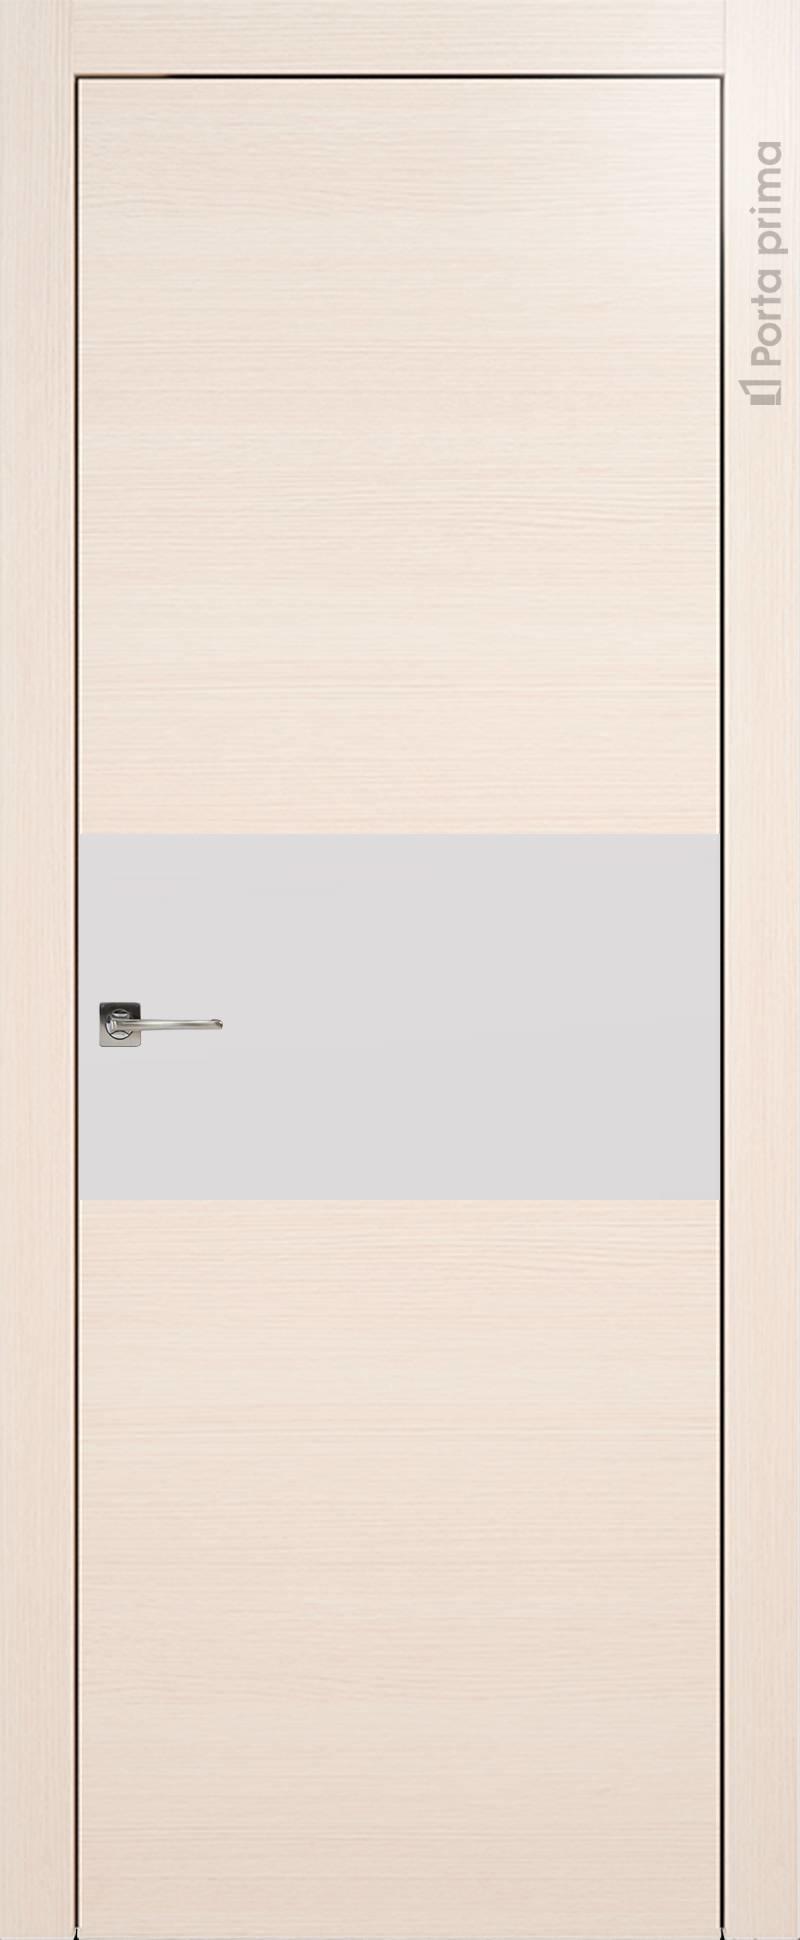 Tivoli Е-4 цвет - Беленый дуб Без стекла (ДГ)